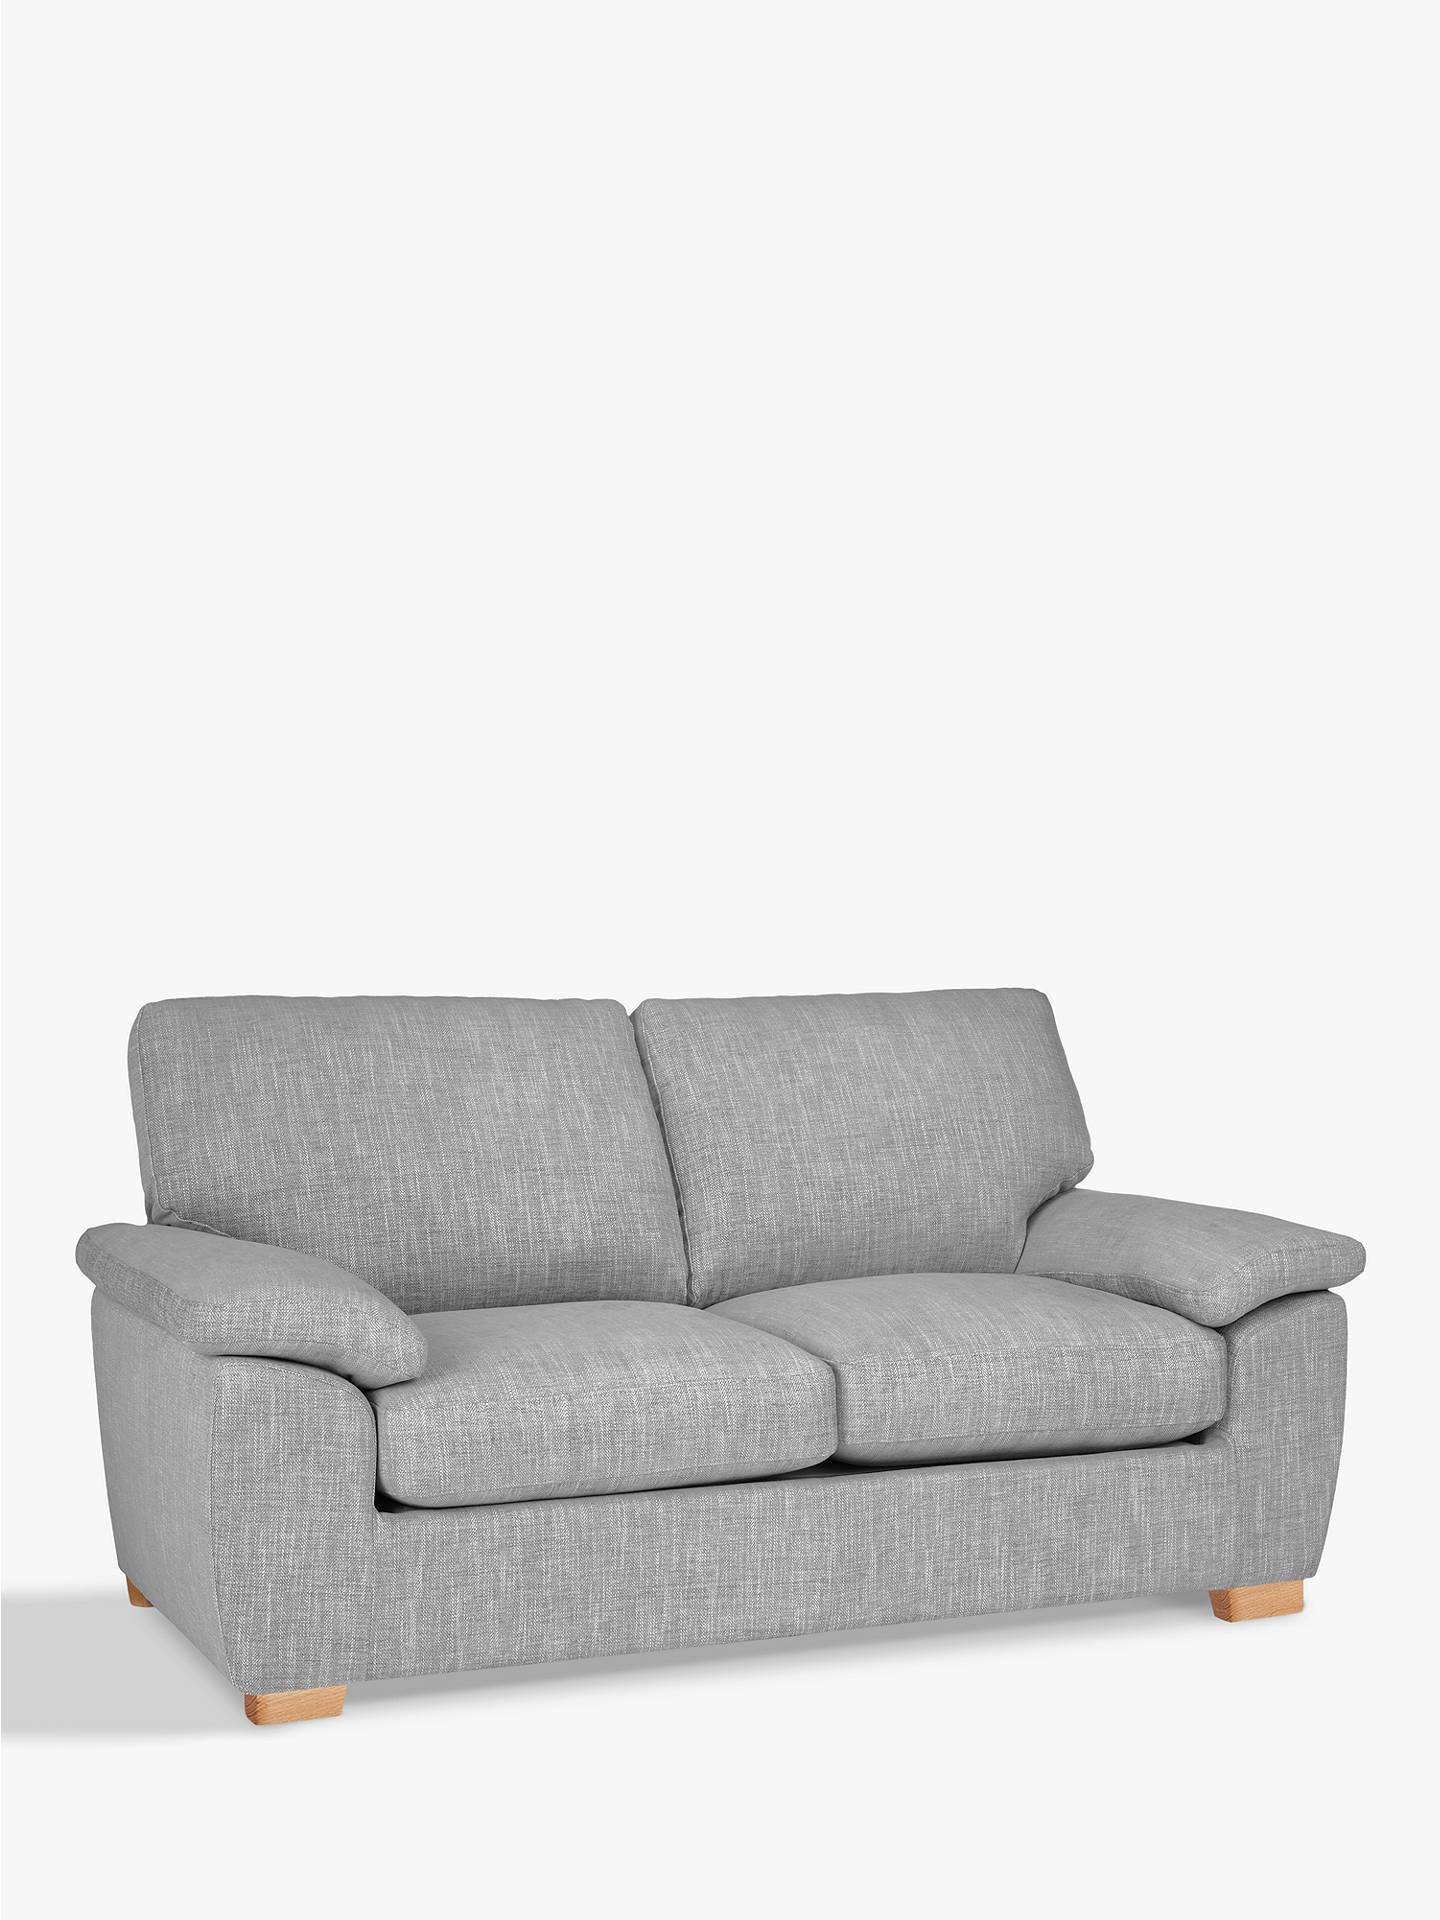 John Lewis & Partners Camden Medium 2 Seater Sofa